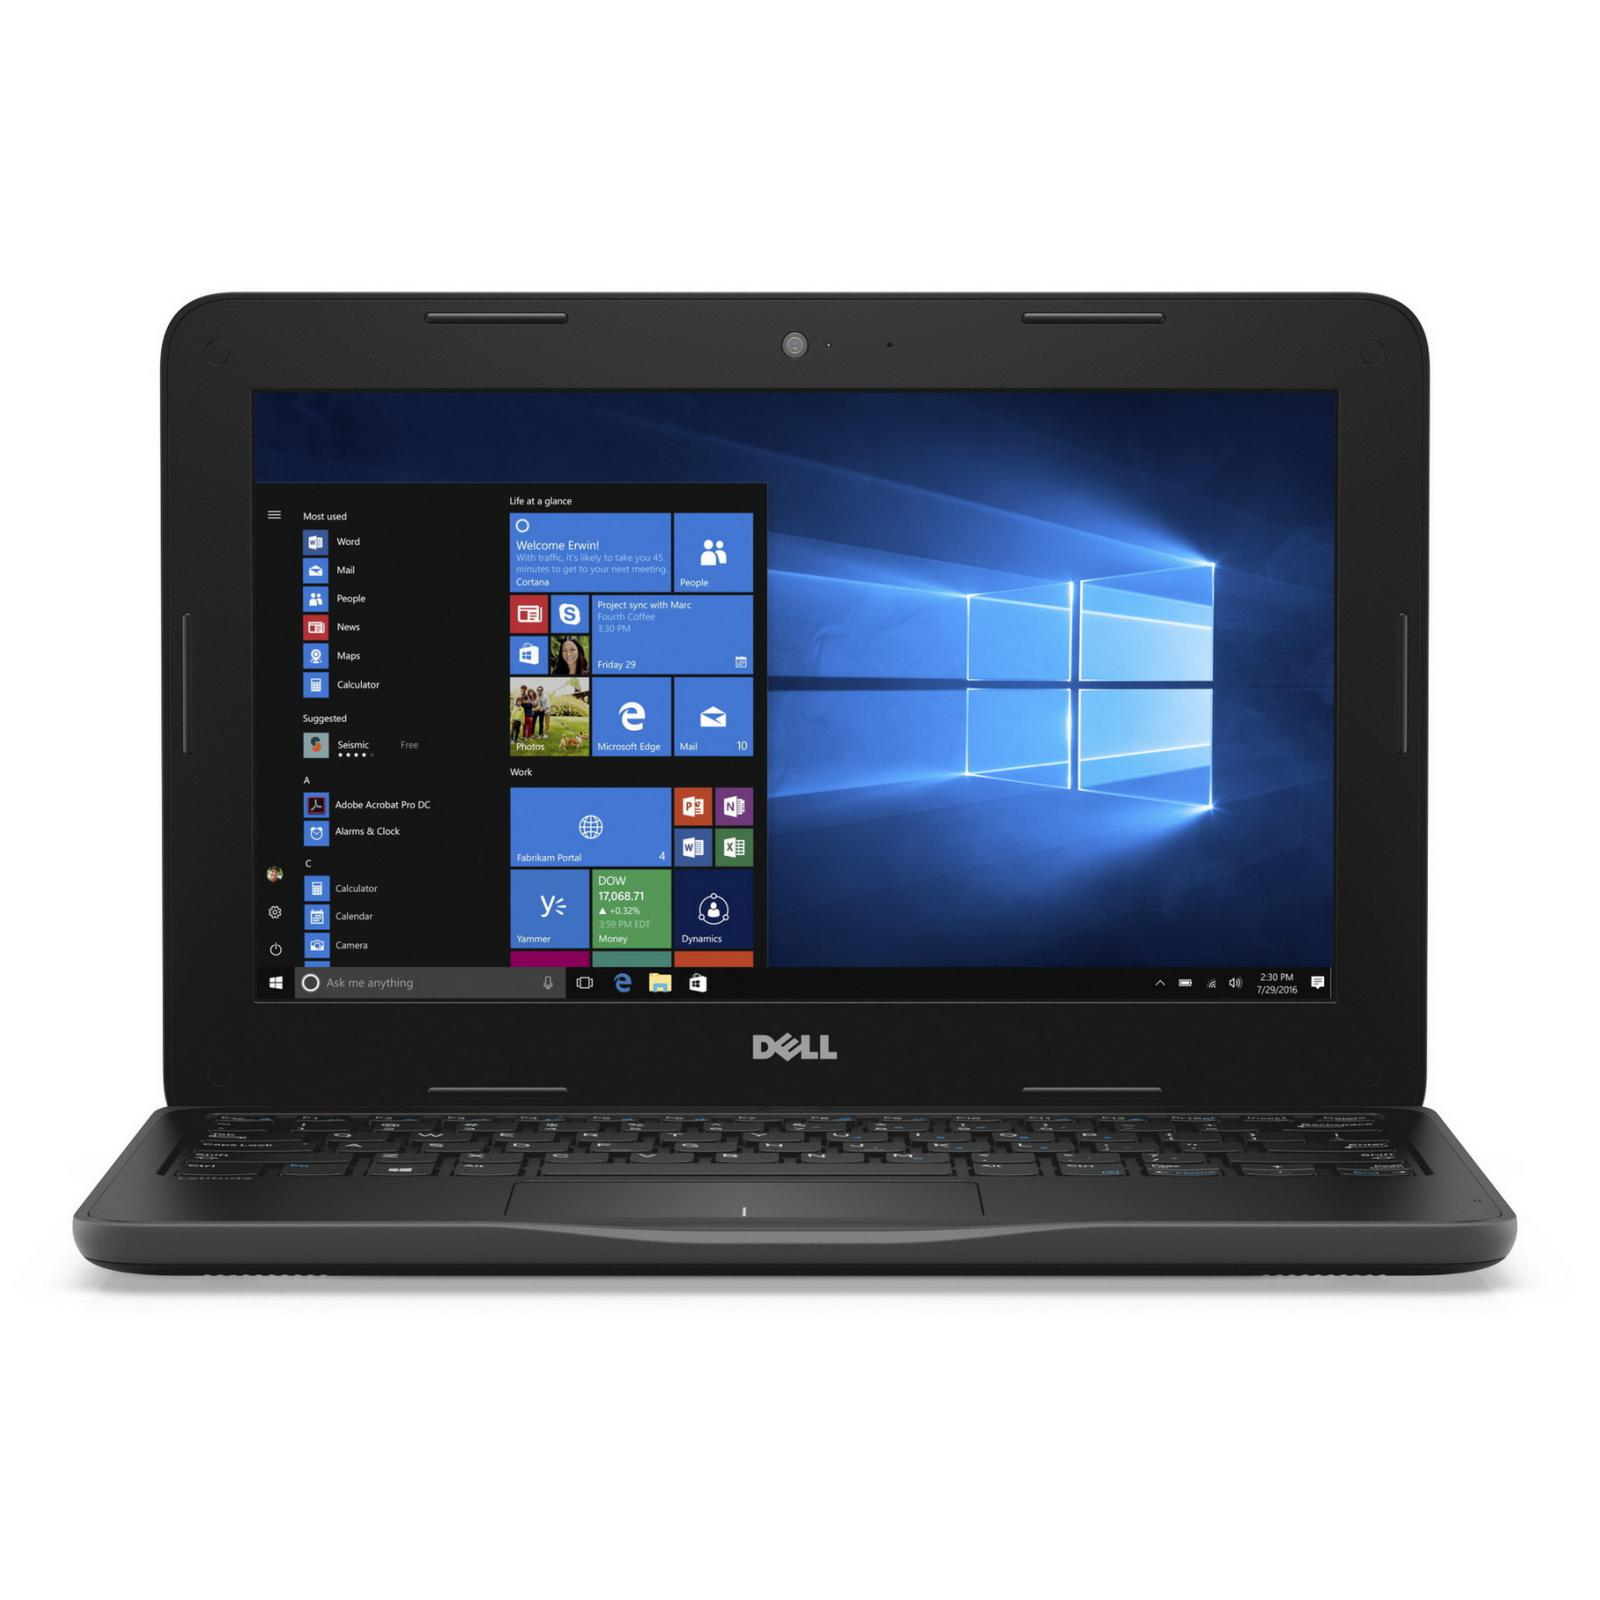 Dell Latitude 11-3189 11.6-inch (2017) - Pentium N4200 - 4 GB - SSD 128 GB